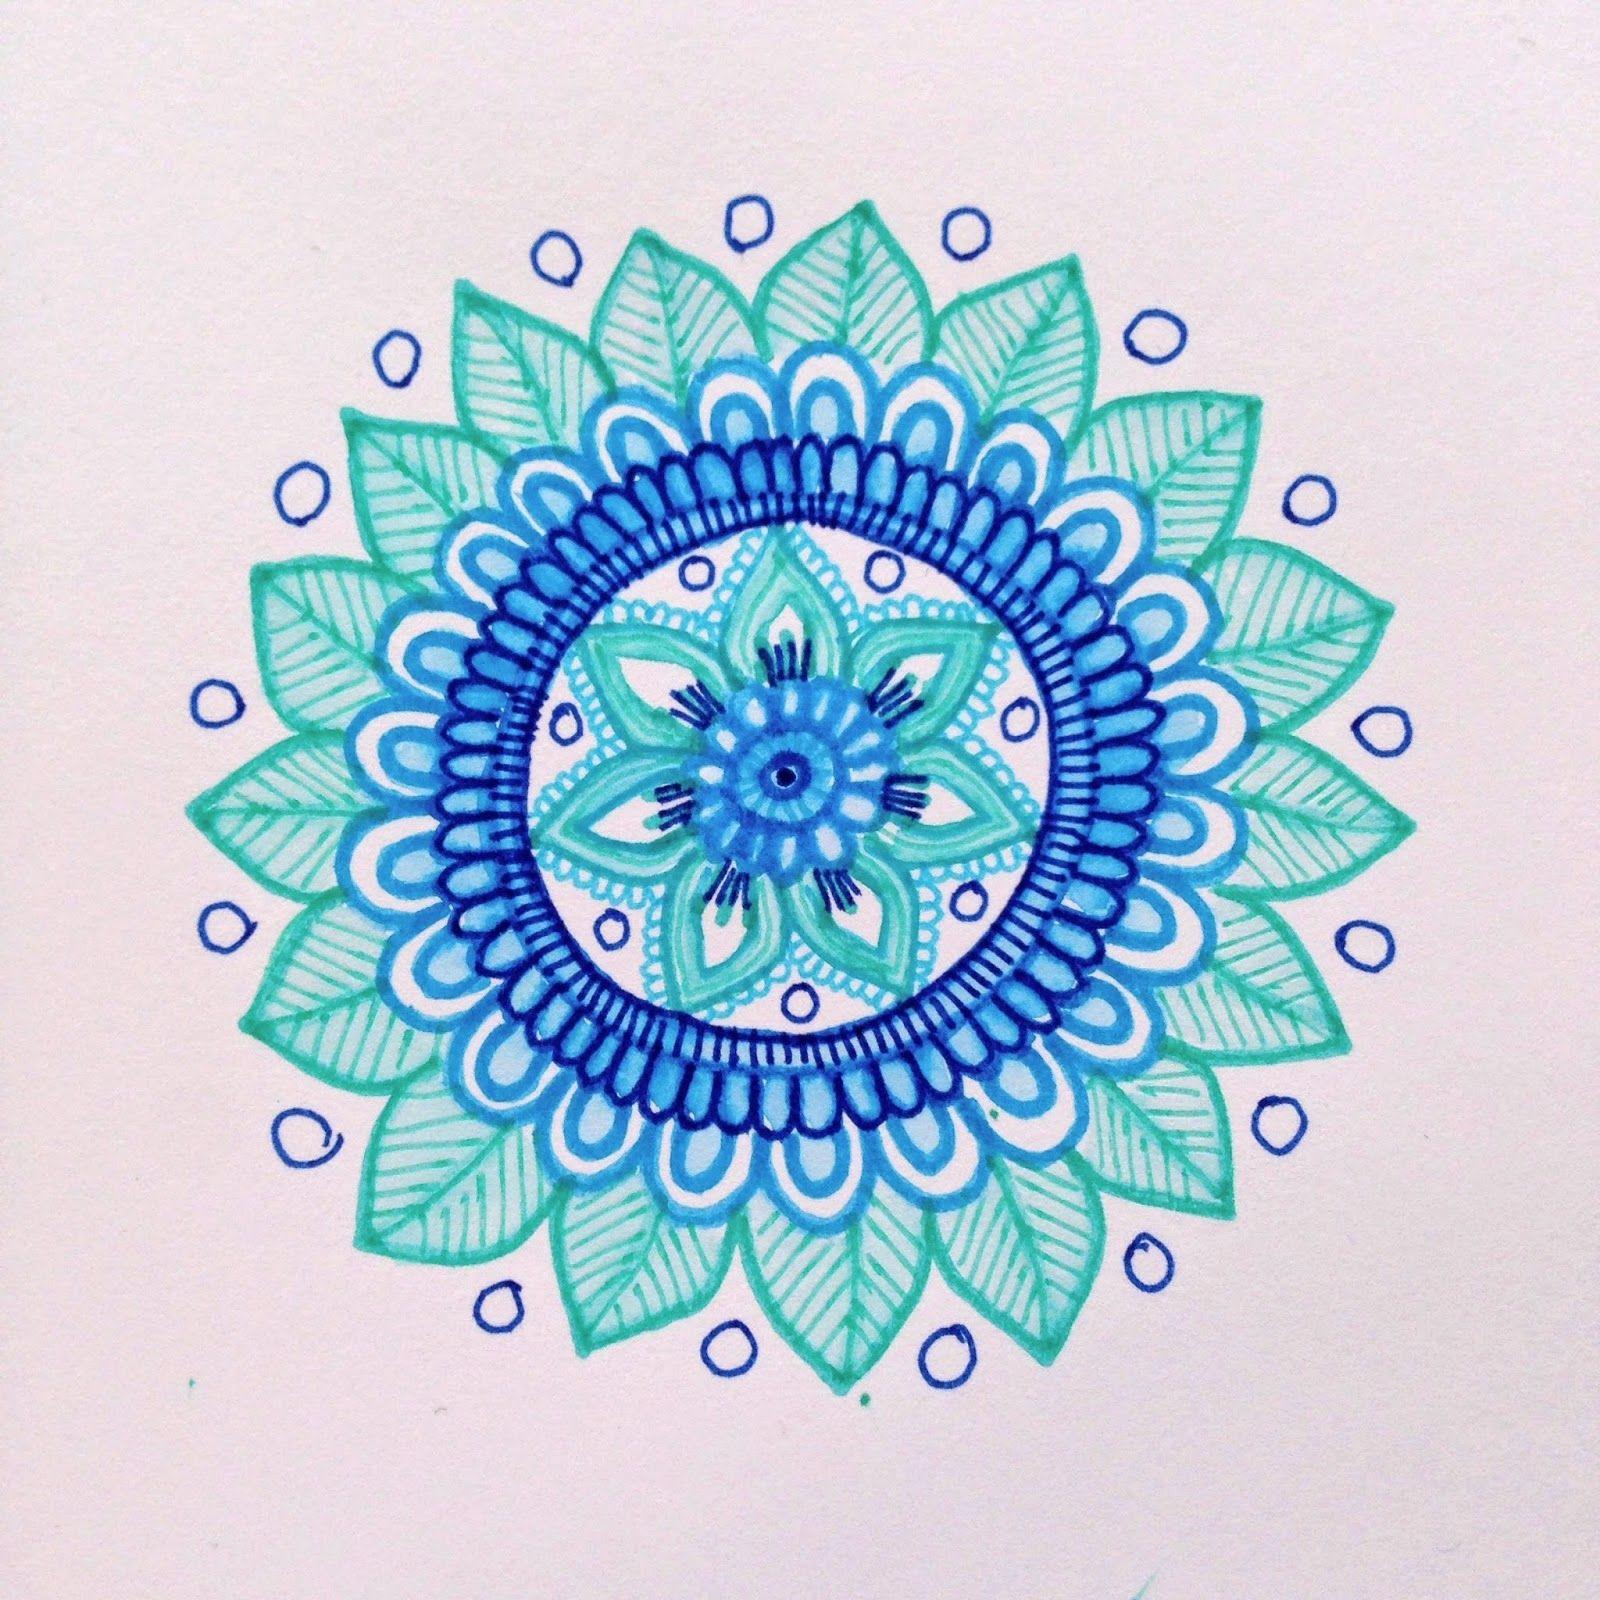 1600x1600 Mehndi Inspired Mandala